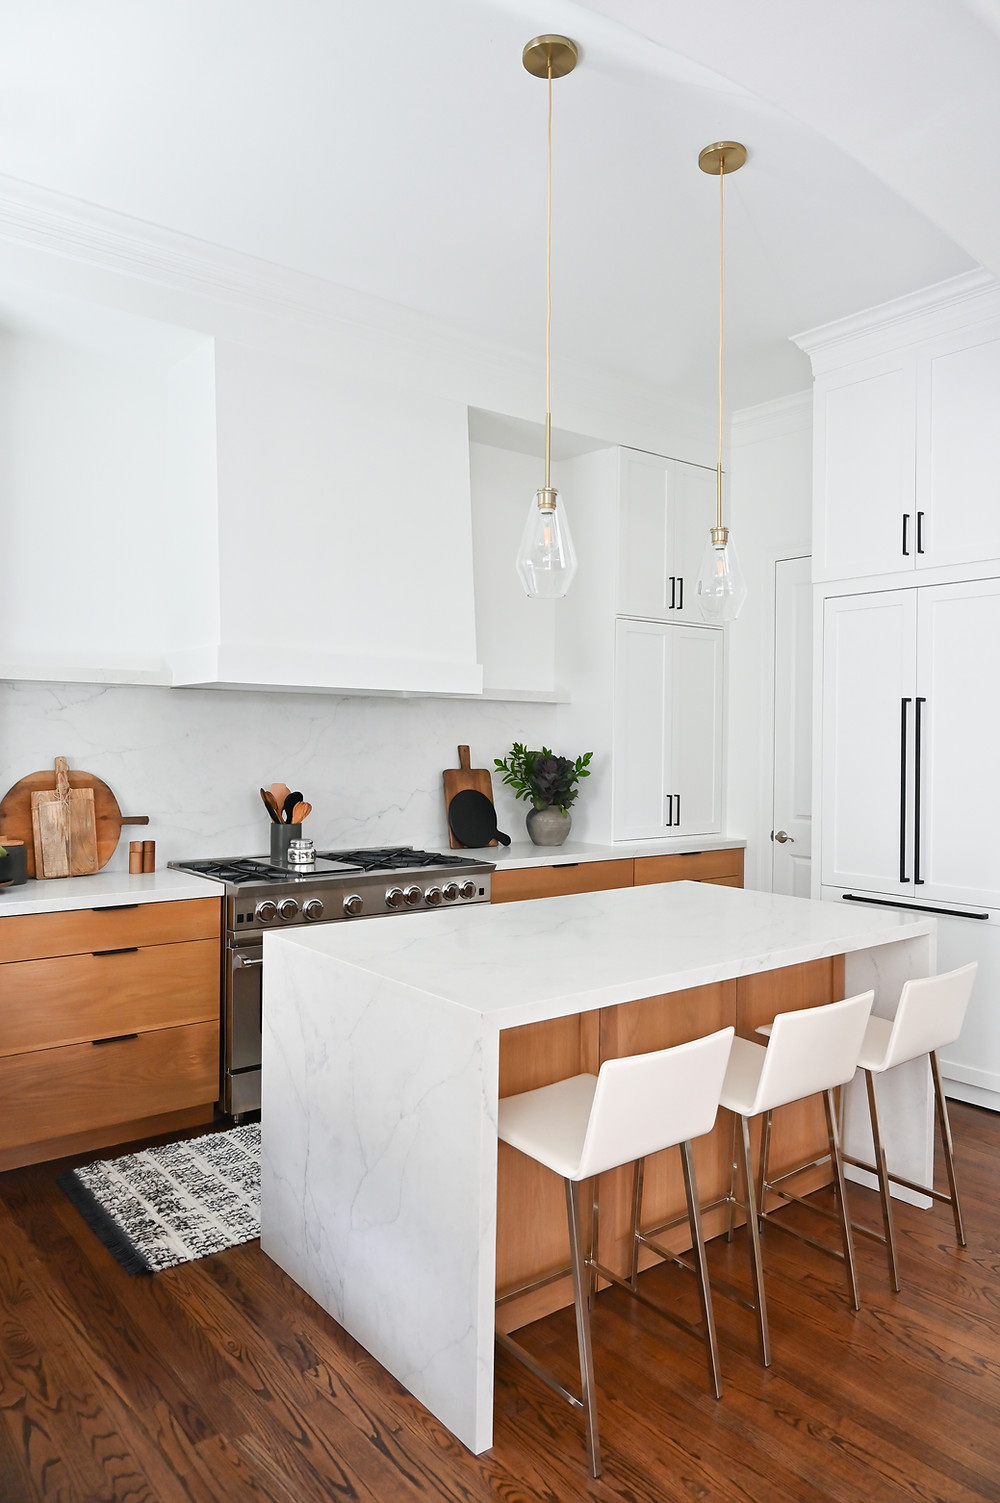 A Modern Minimalist Kitchen featuring waterfall countertop island by Houston interior design firm Nancy Lane Interiors.